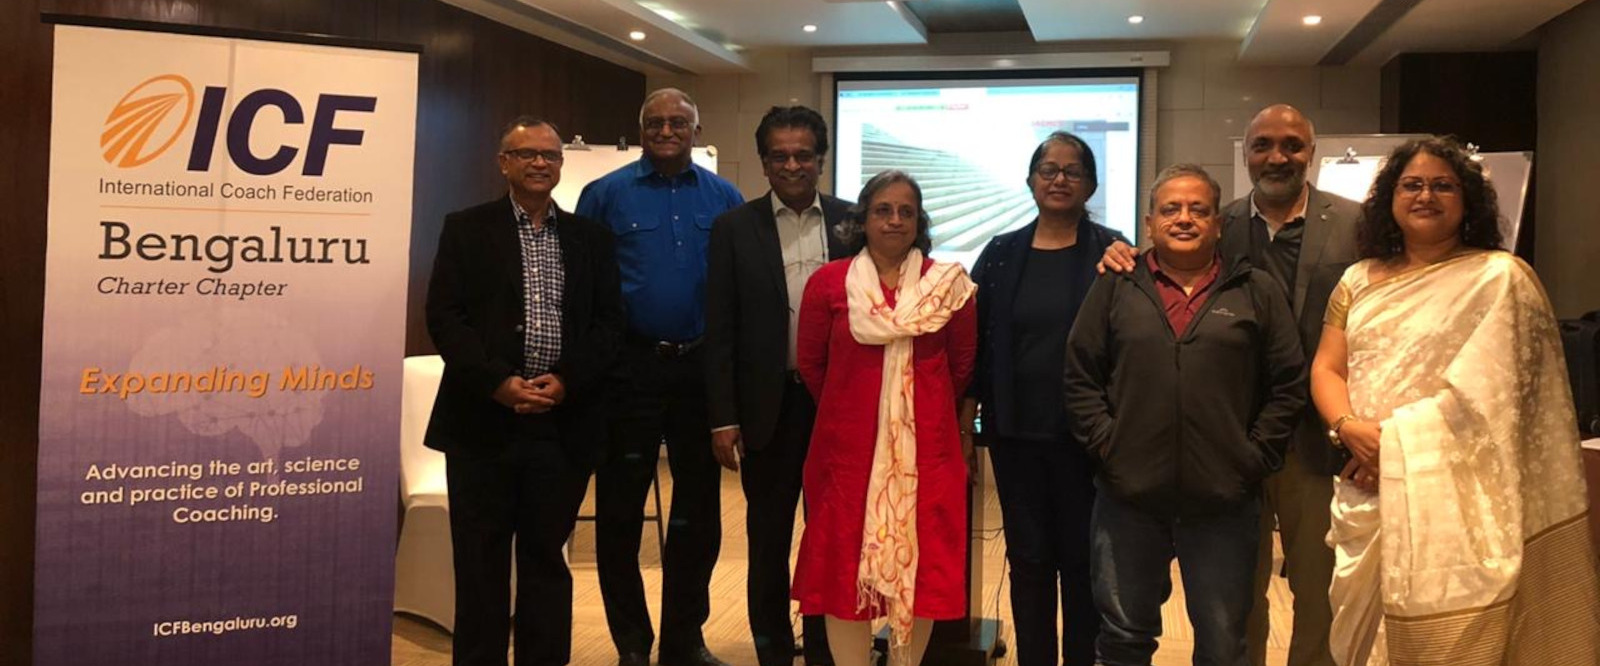 ICF Bengaluru Chapter